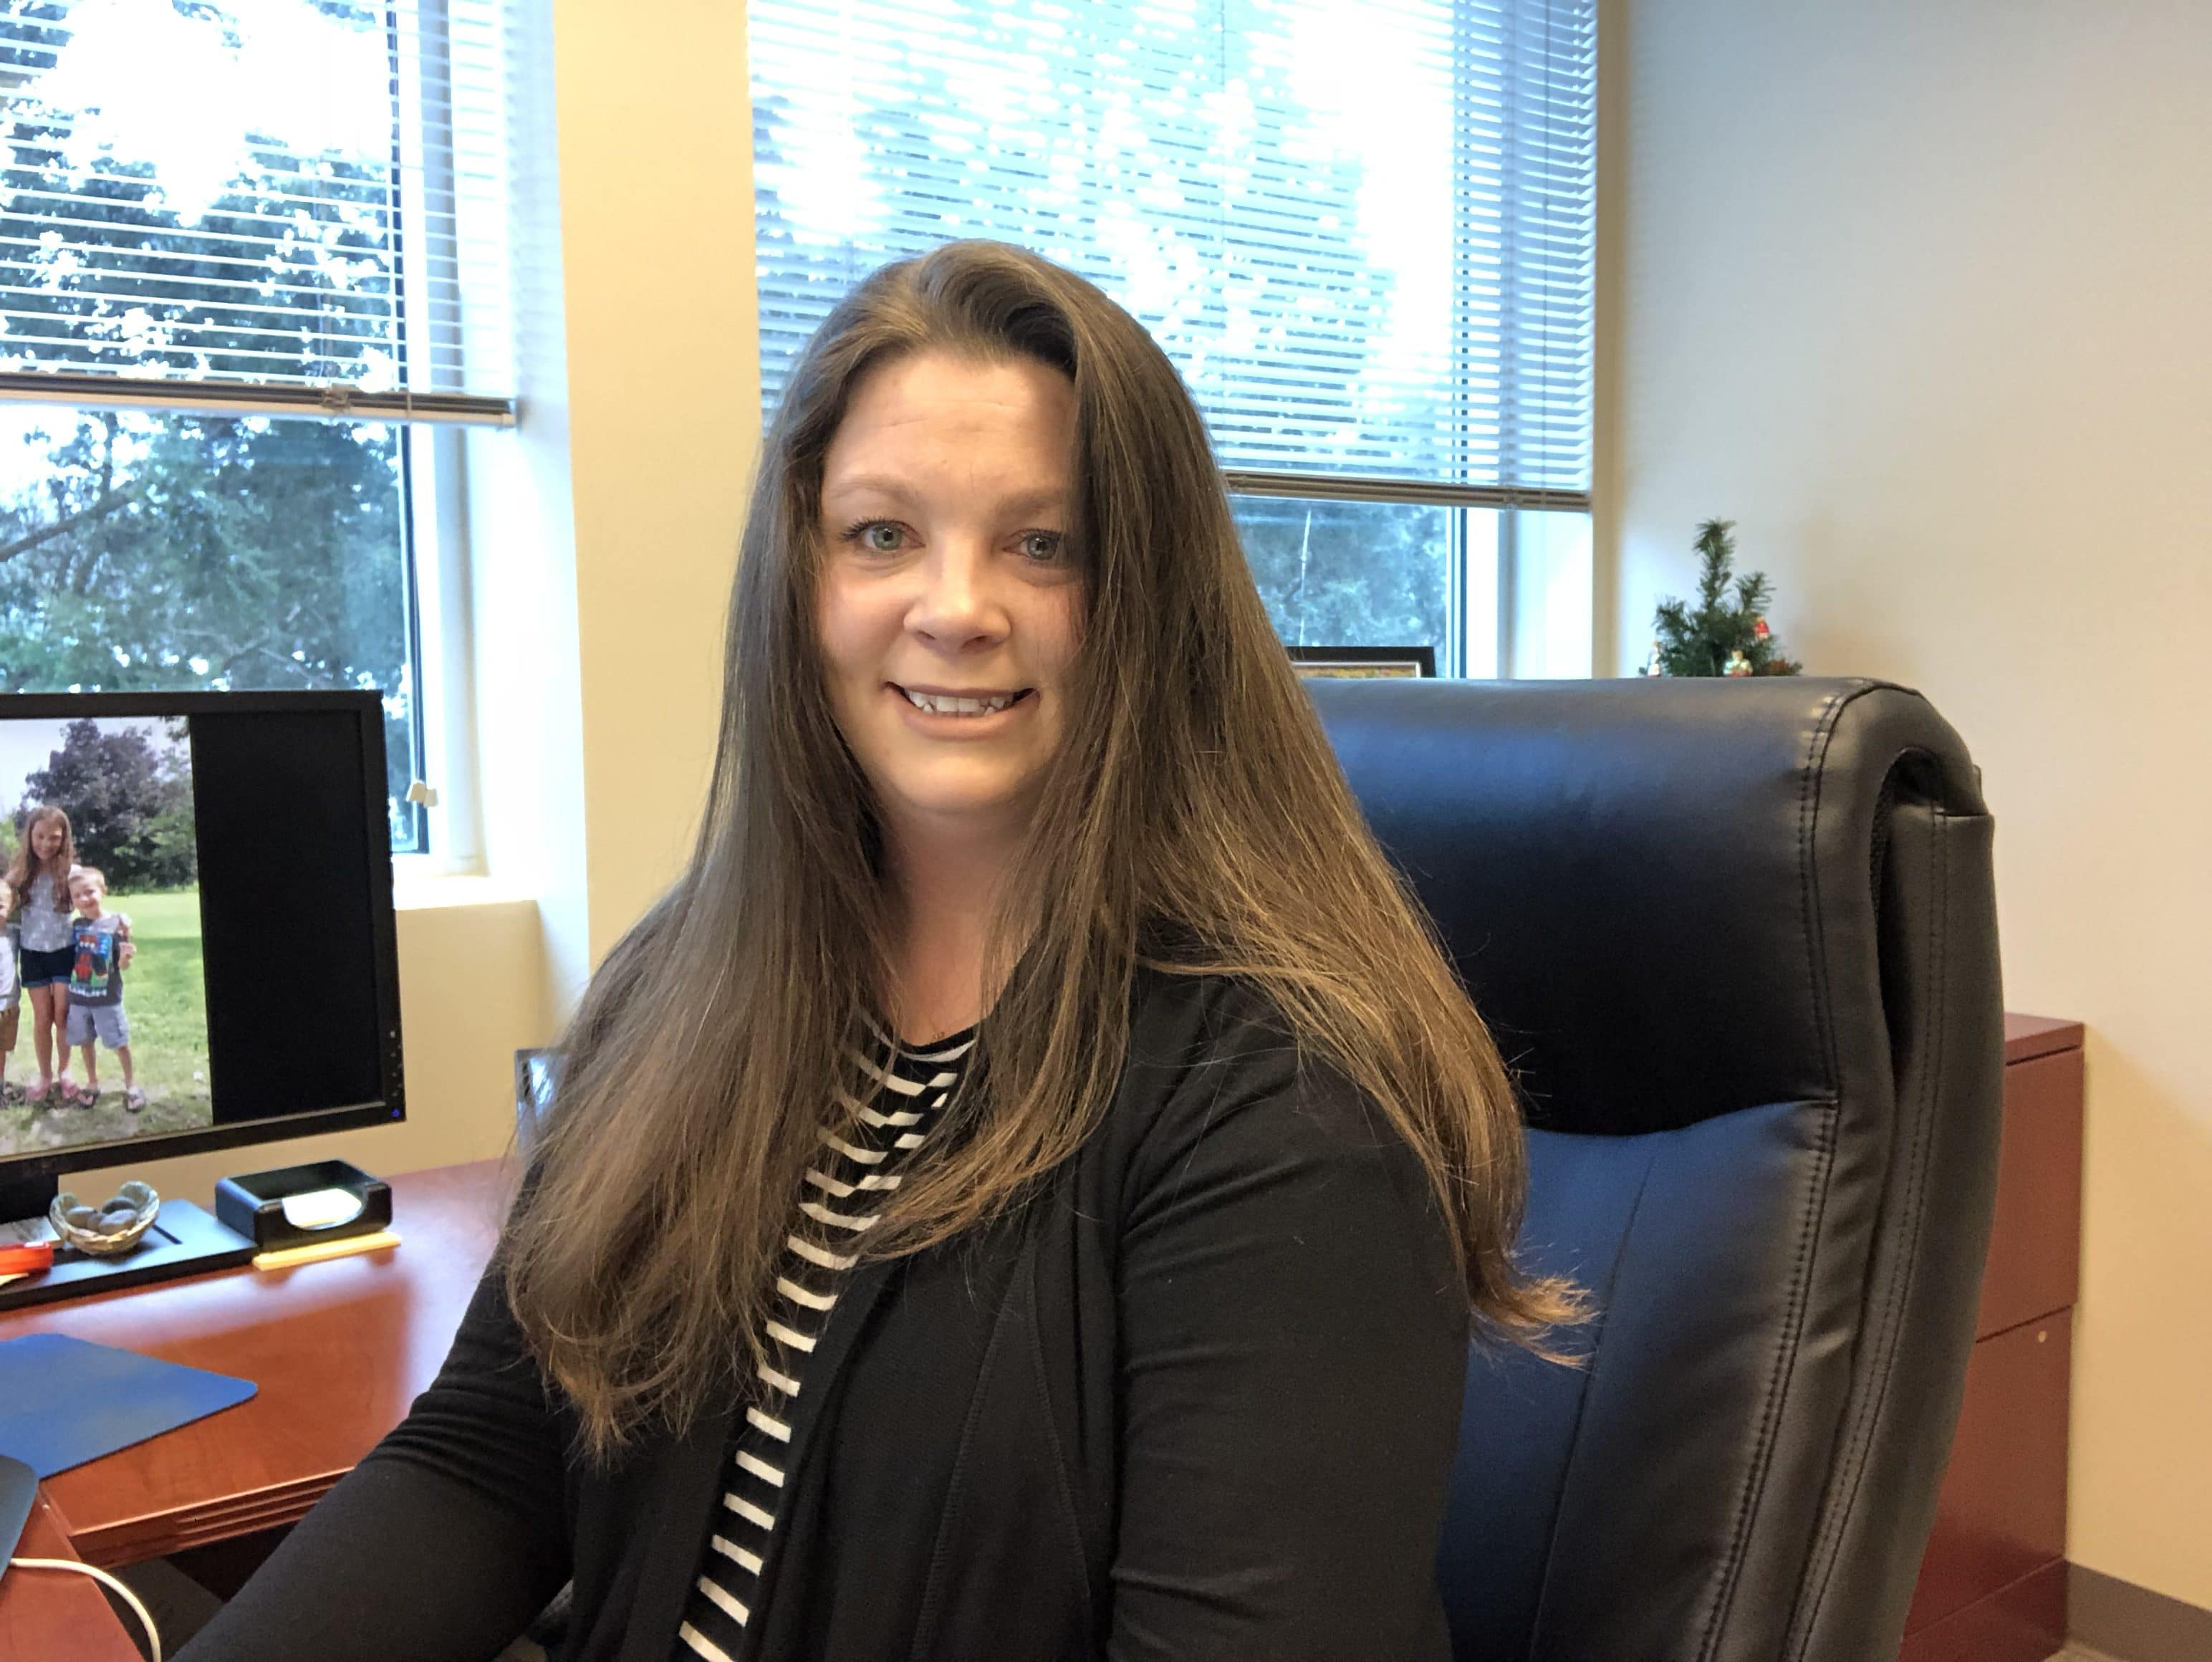 Michelle Delgaudio, Senior Loan Processor at Northeast Funding Services